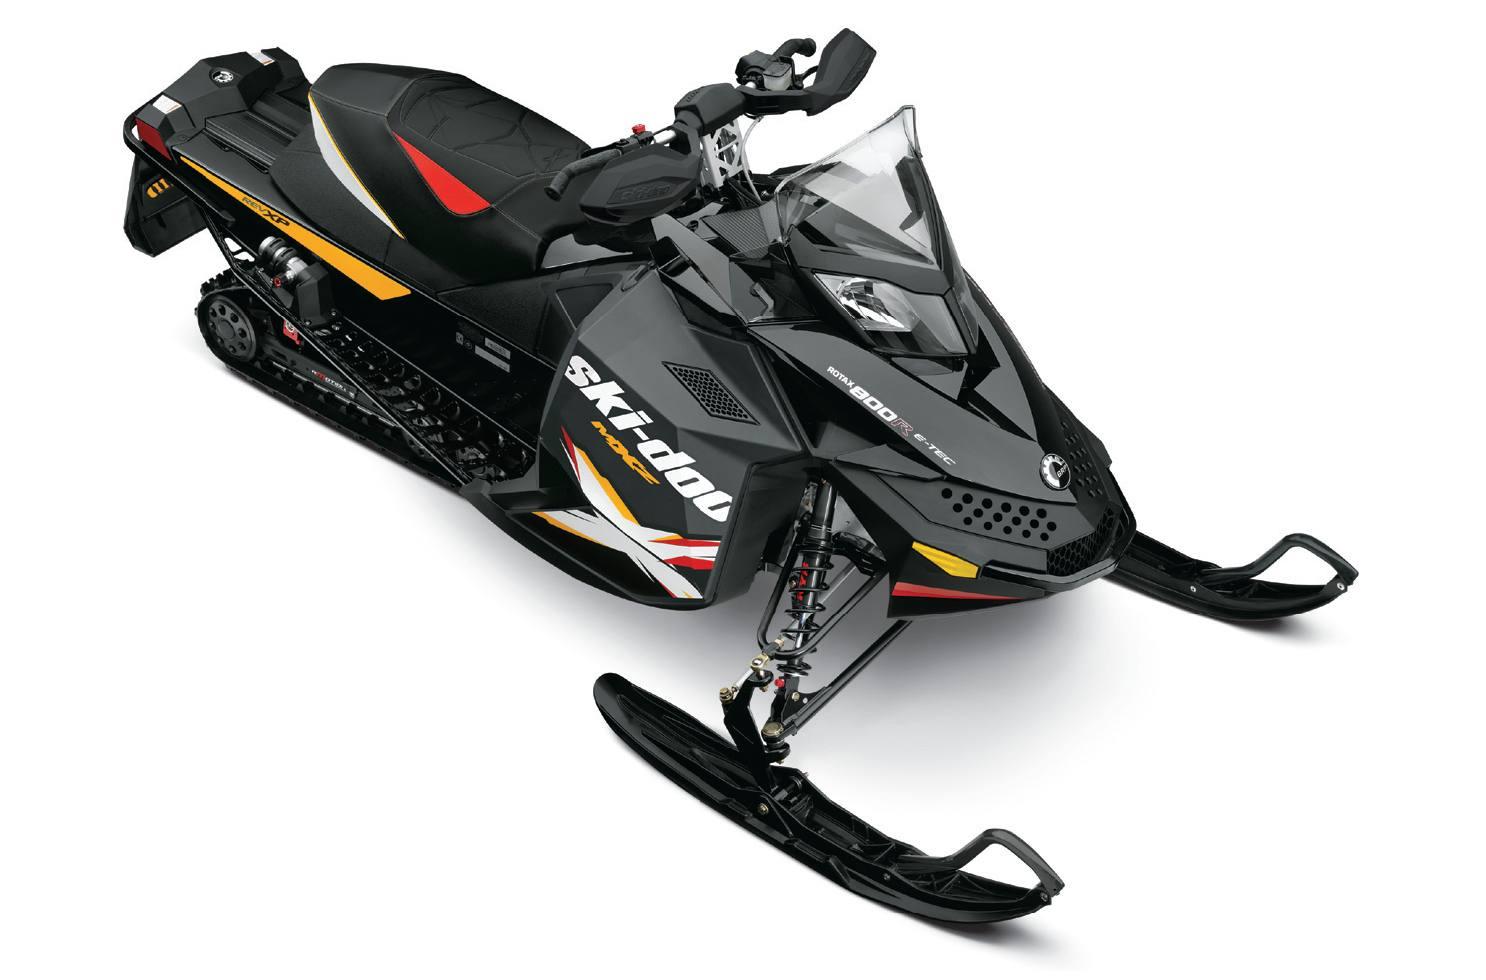 hight resolution of 2012 ski doo mx z x rotax e tec 800r lynn hoy enterprises ltd